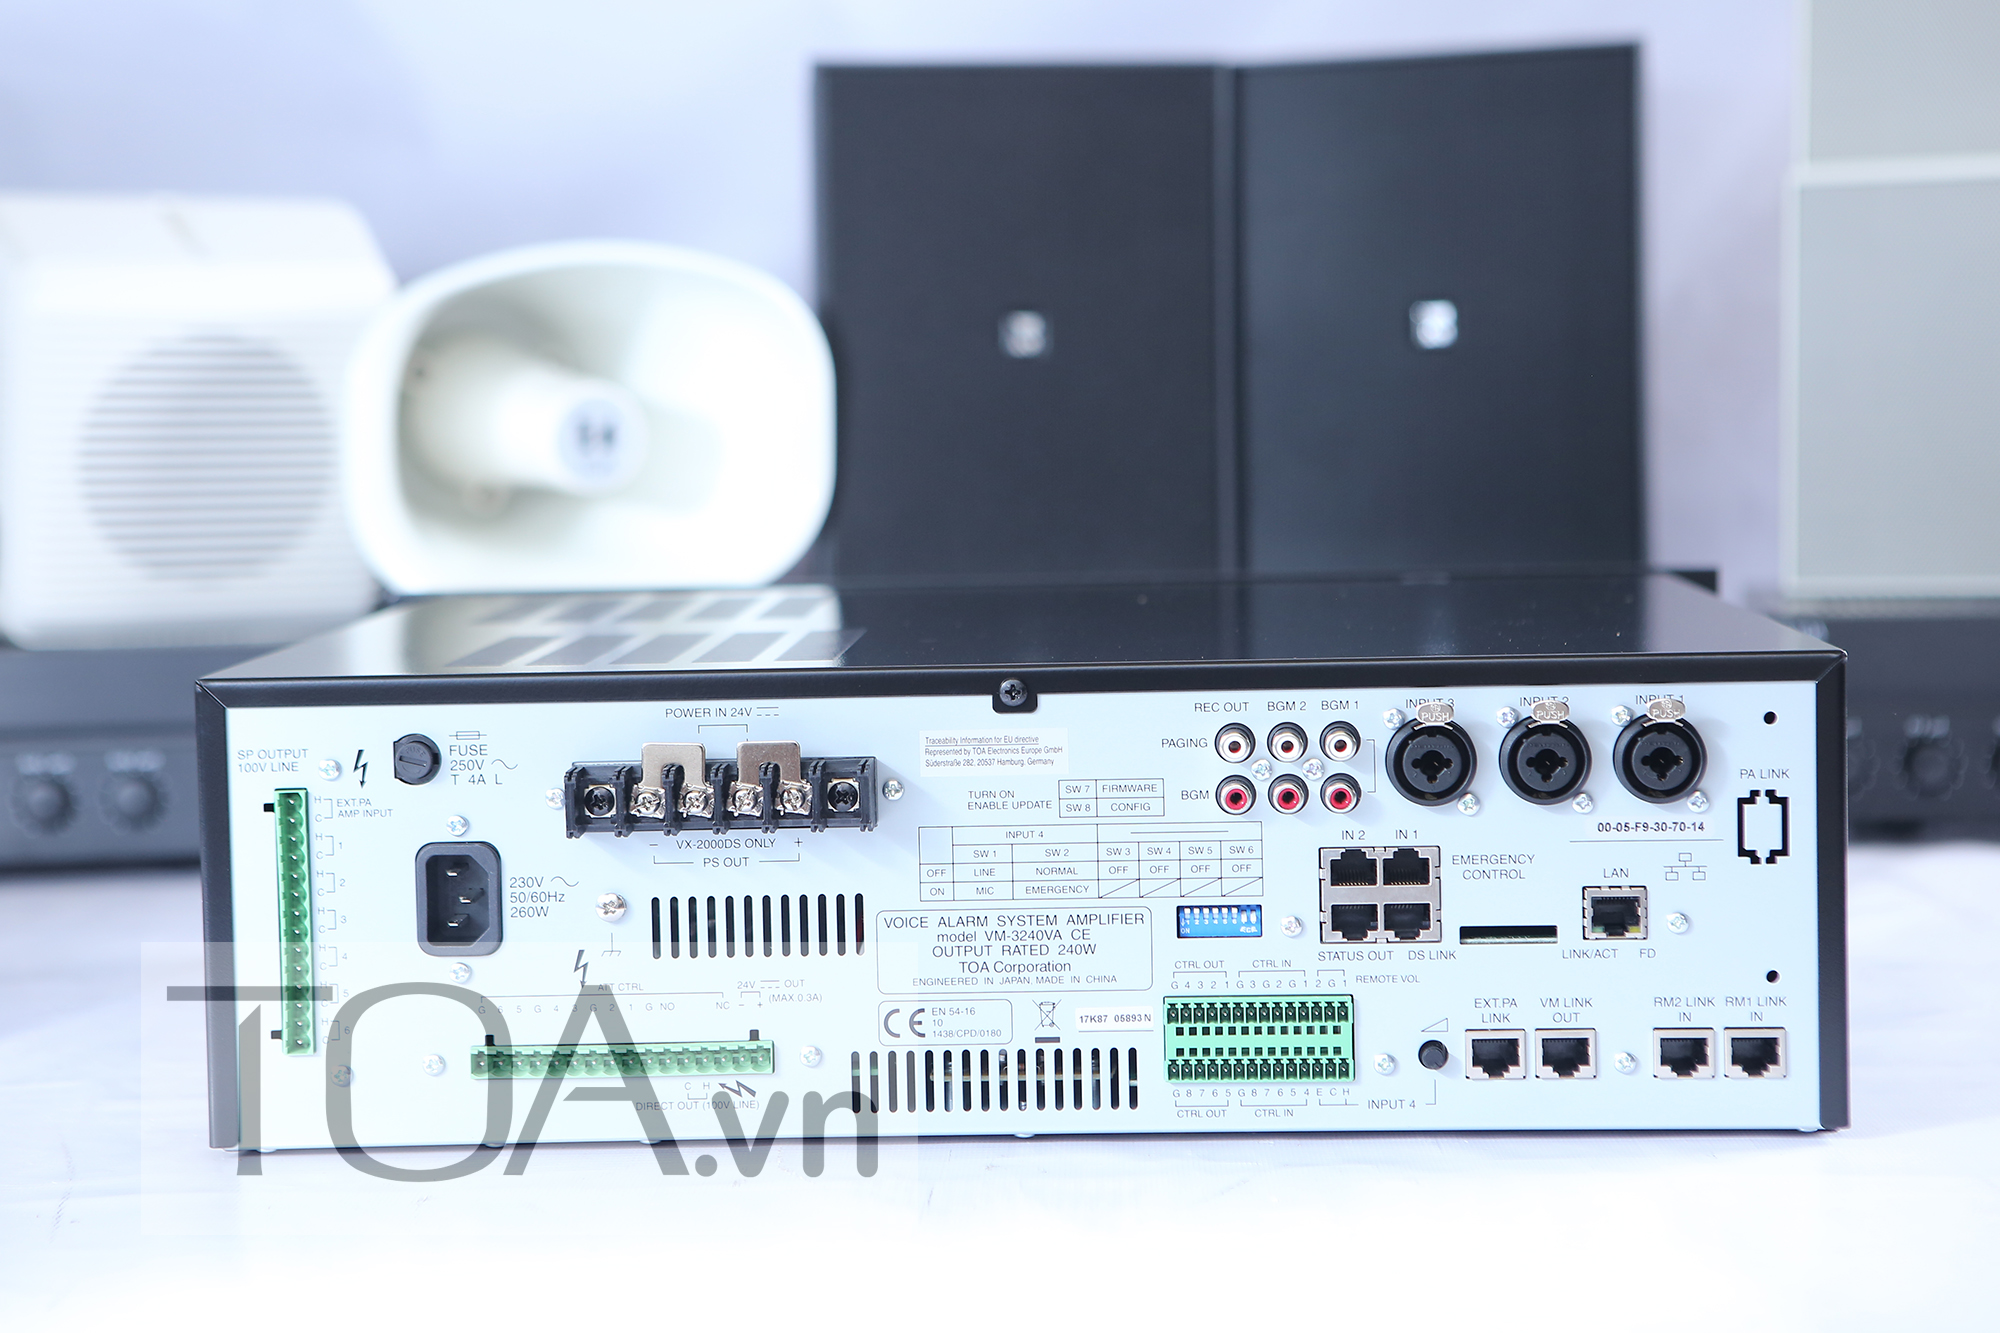 AMLY 240W TOA VM-3240VA, AMPLI 240W TOA VM-3240VA, TOA VM-3240VA